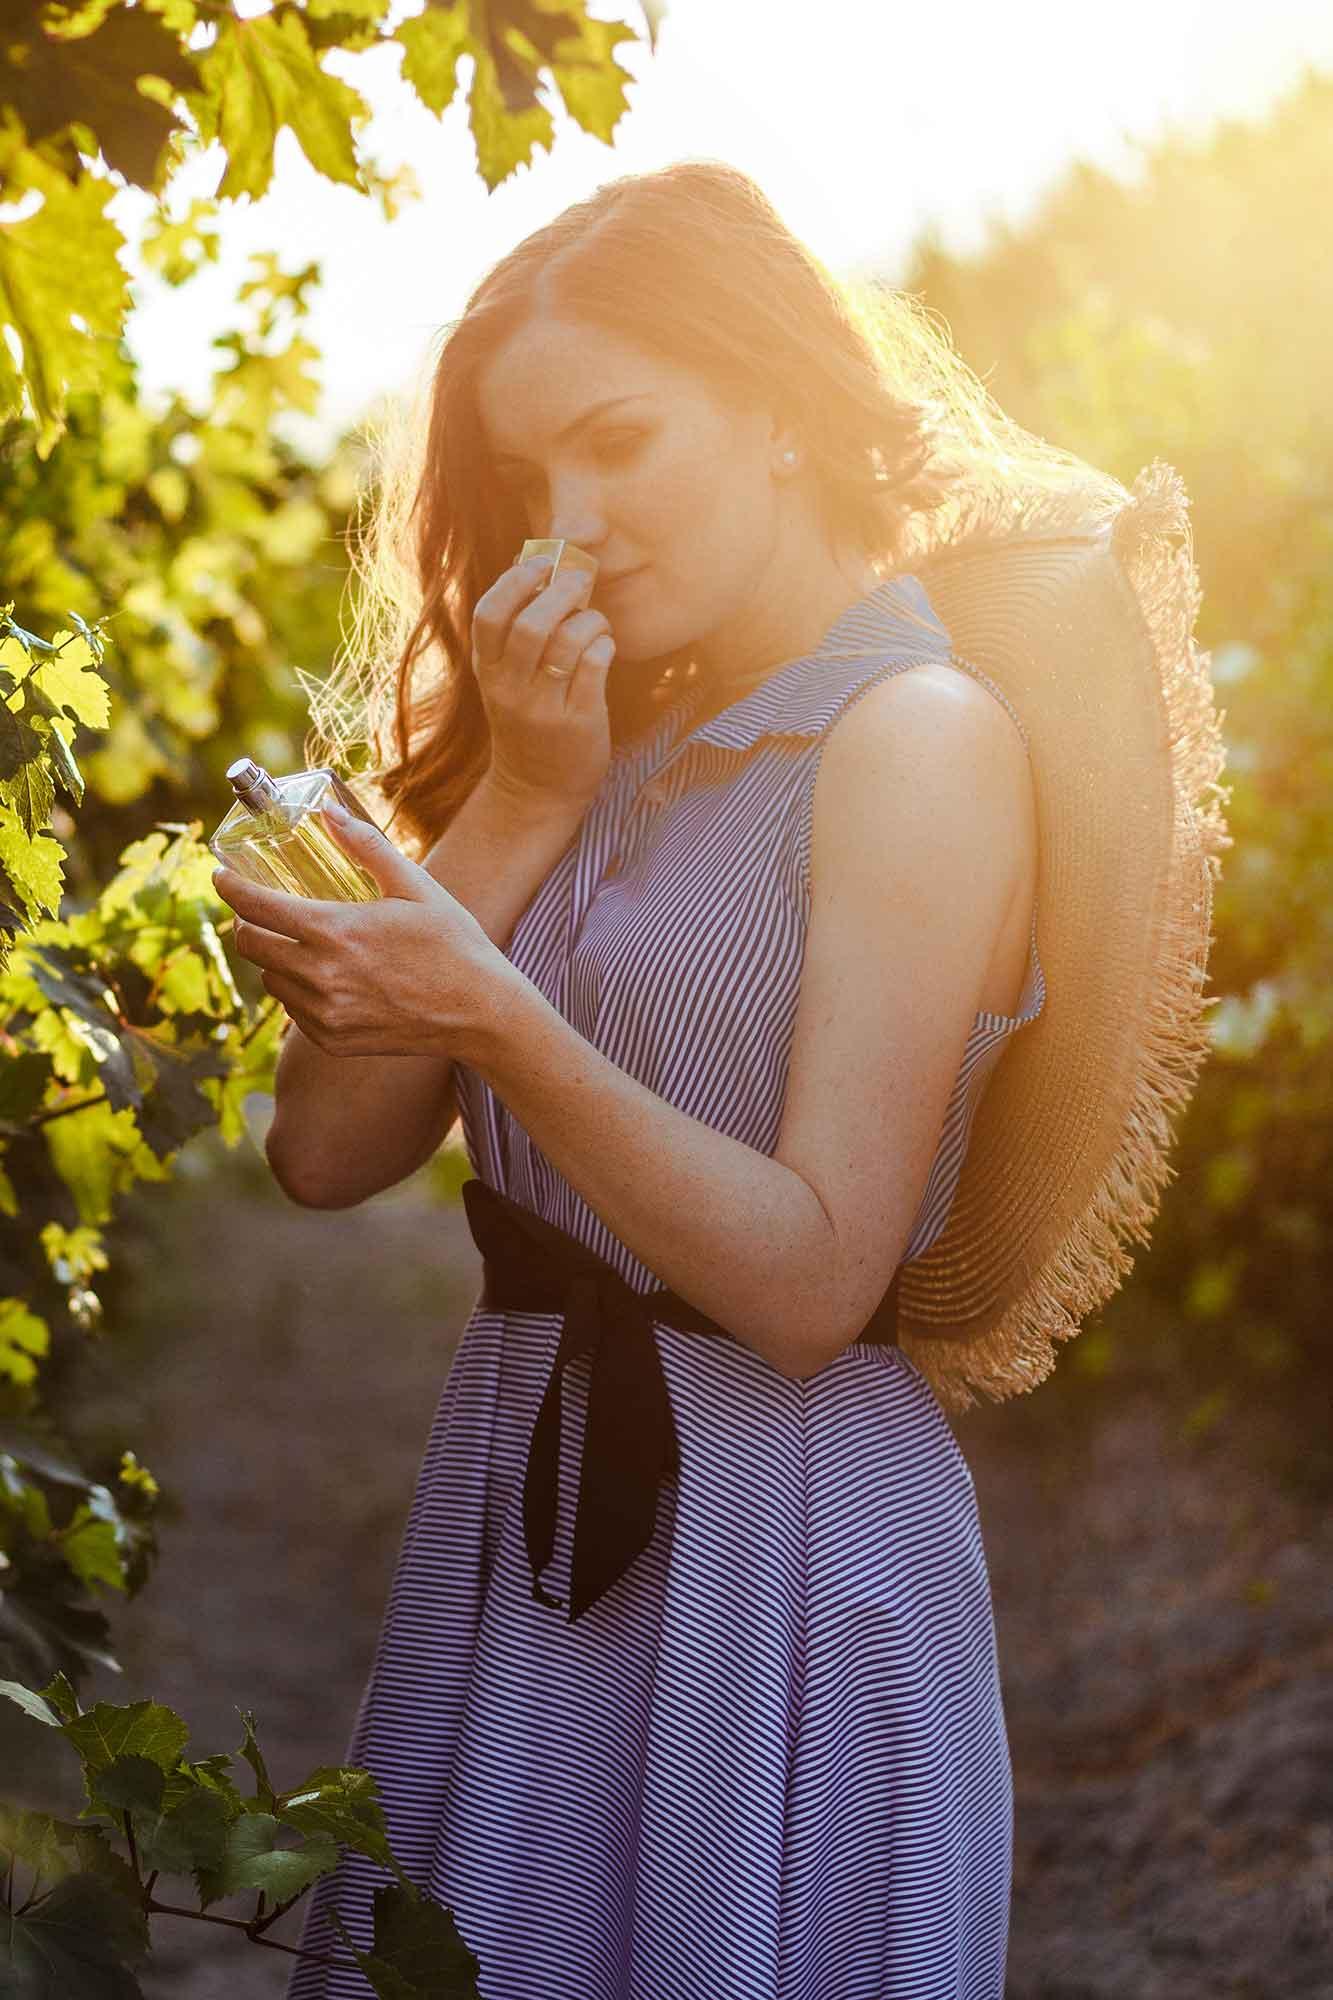 Smelling italian niche perfume